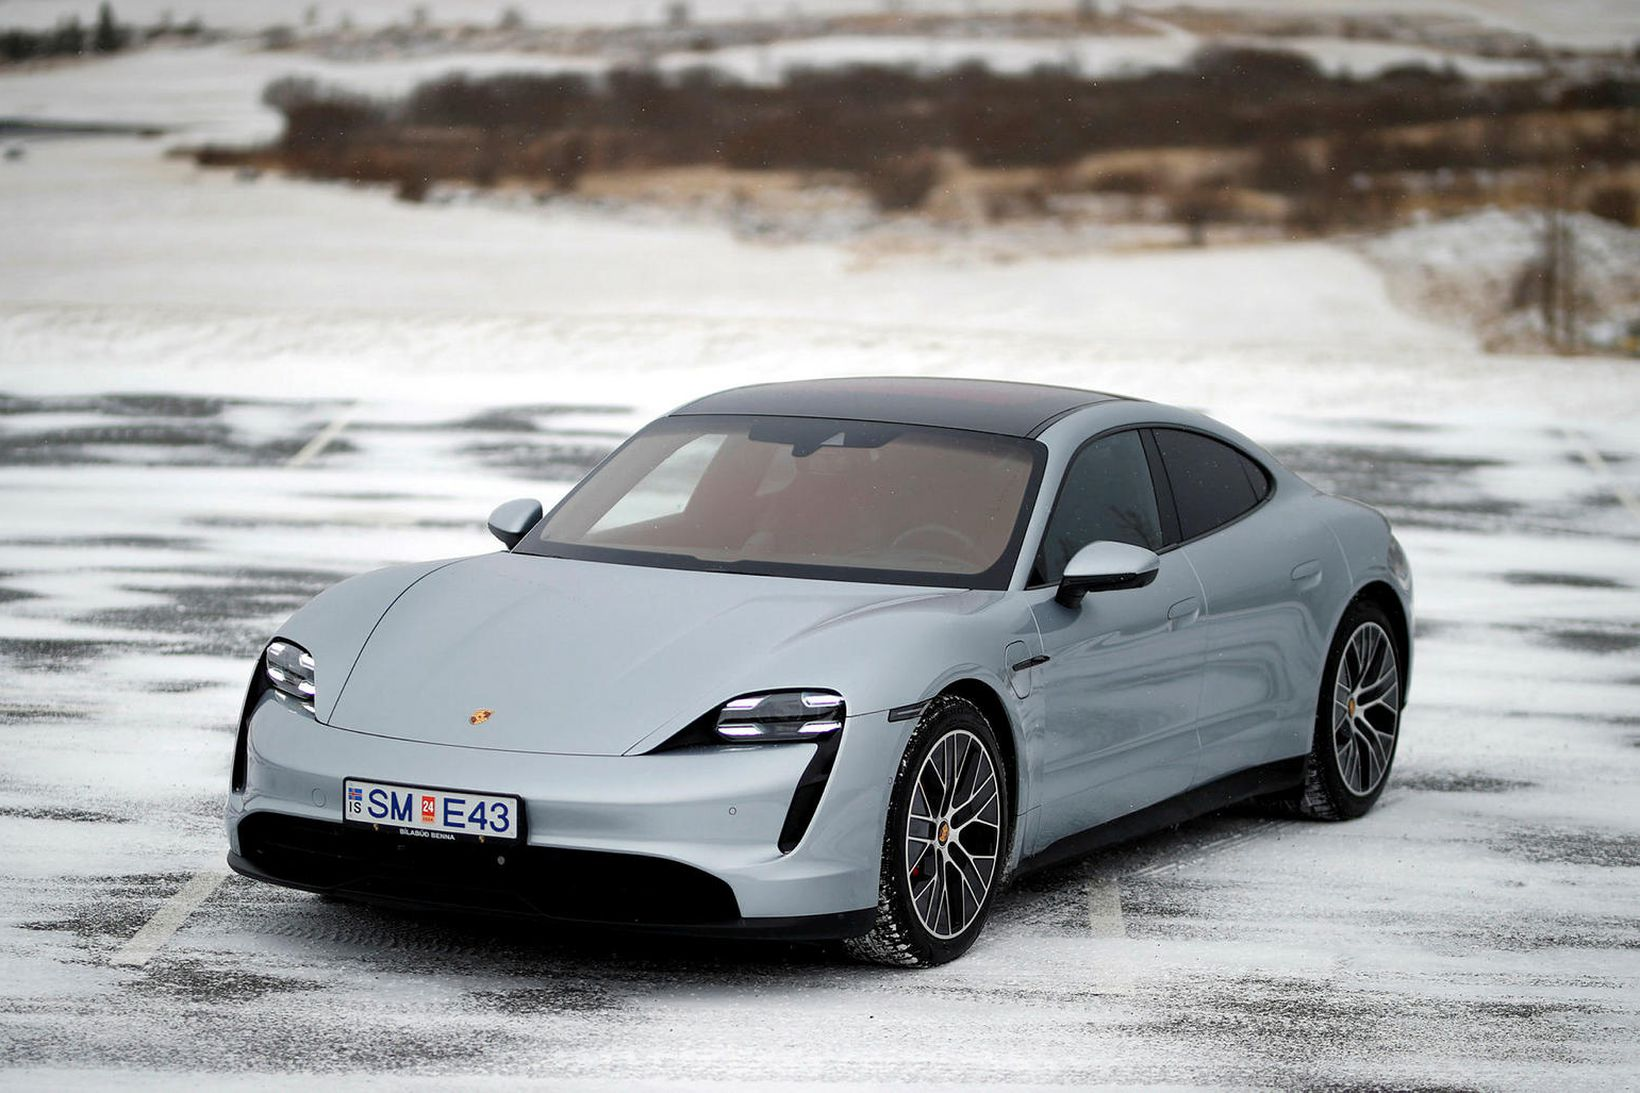 Porsche Taycan 4S er stórkostlegur sportbíll jafnvel þótt hann sé …